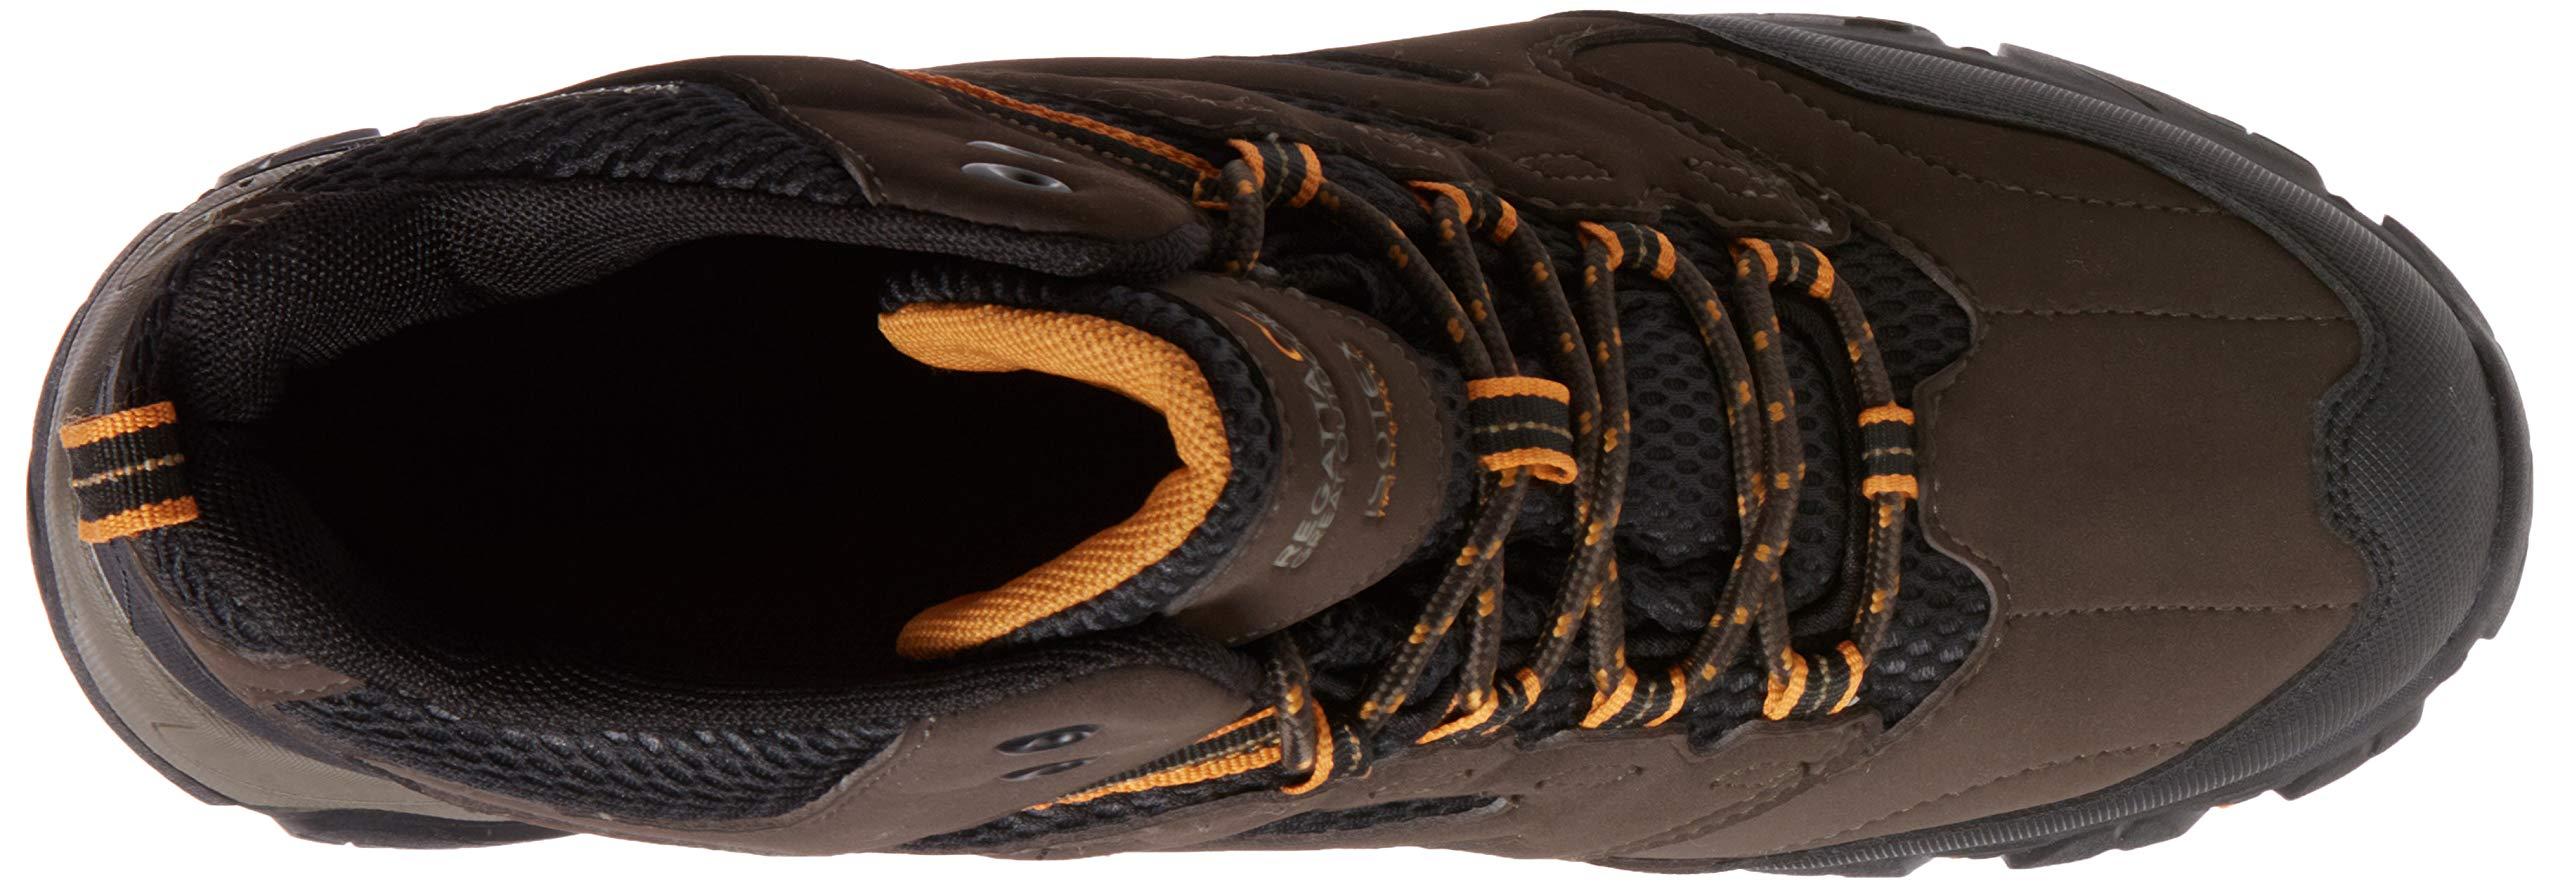 Regatta Men's Holcombe IEP Mid High Rise Hiking Boots 7